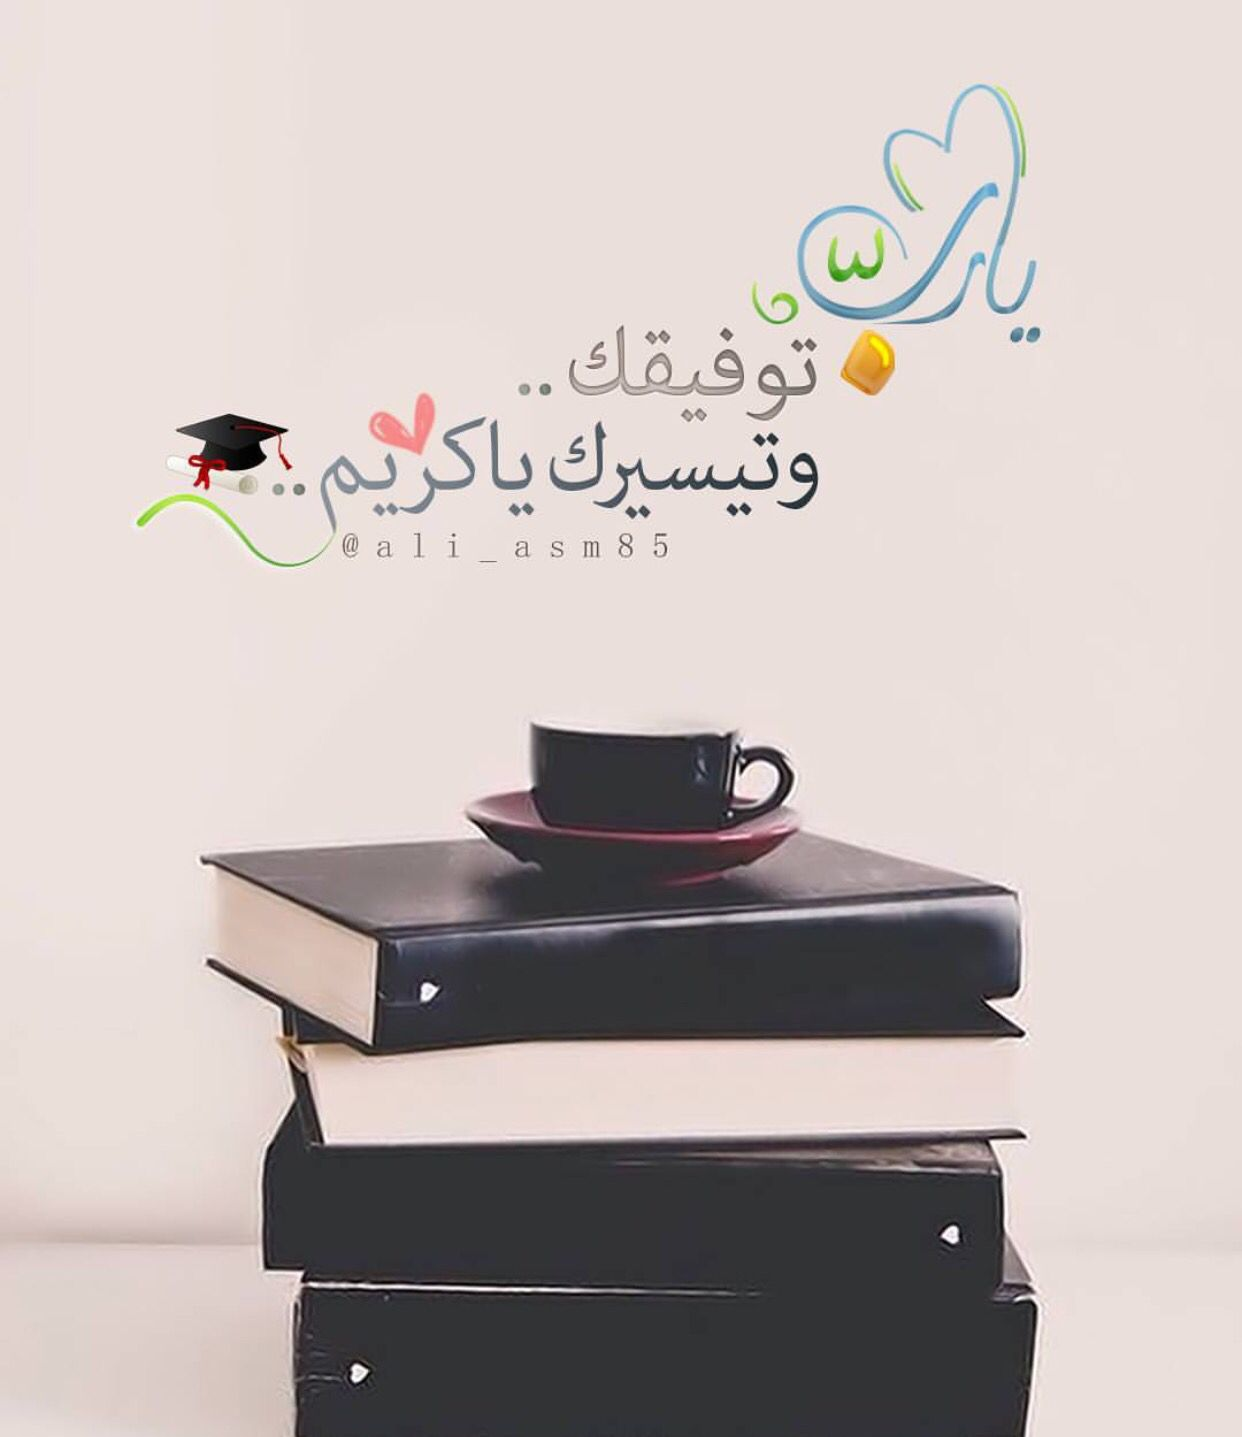 يارررب توفيقك وتيسيرك ياكريم Quran Quotes Quotes Books